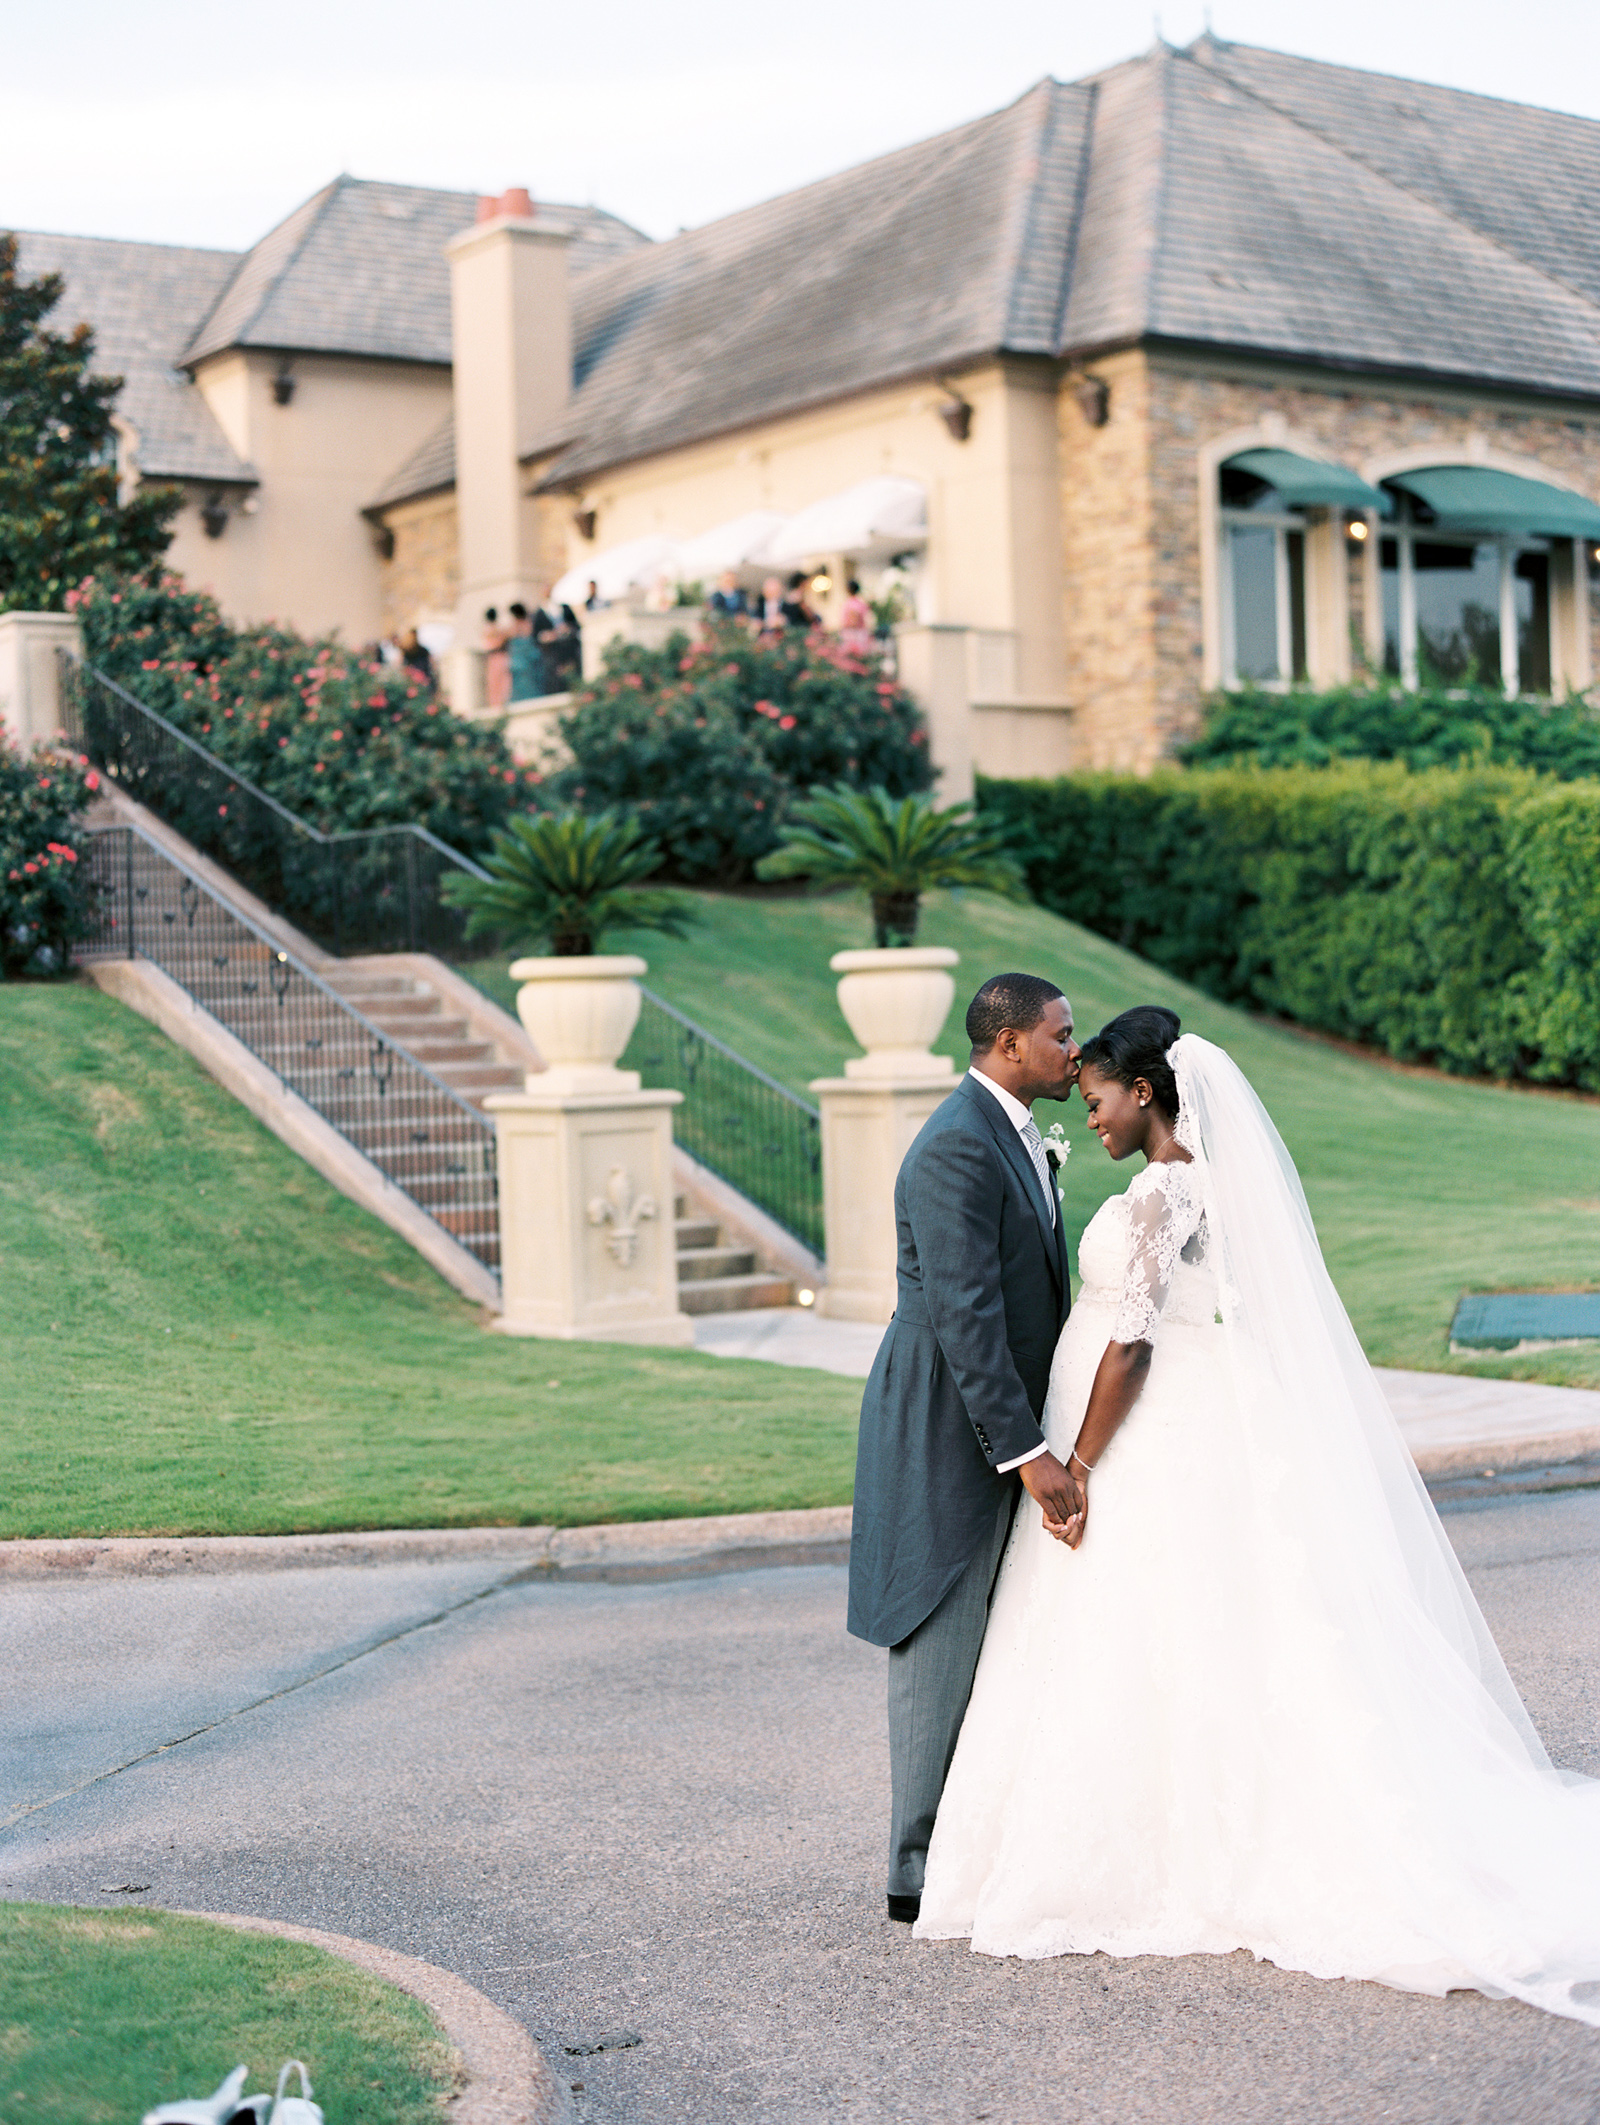 0030_Royal_Oaks_Country_Club_Wedding.jpg